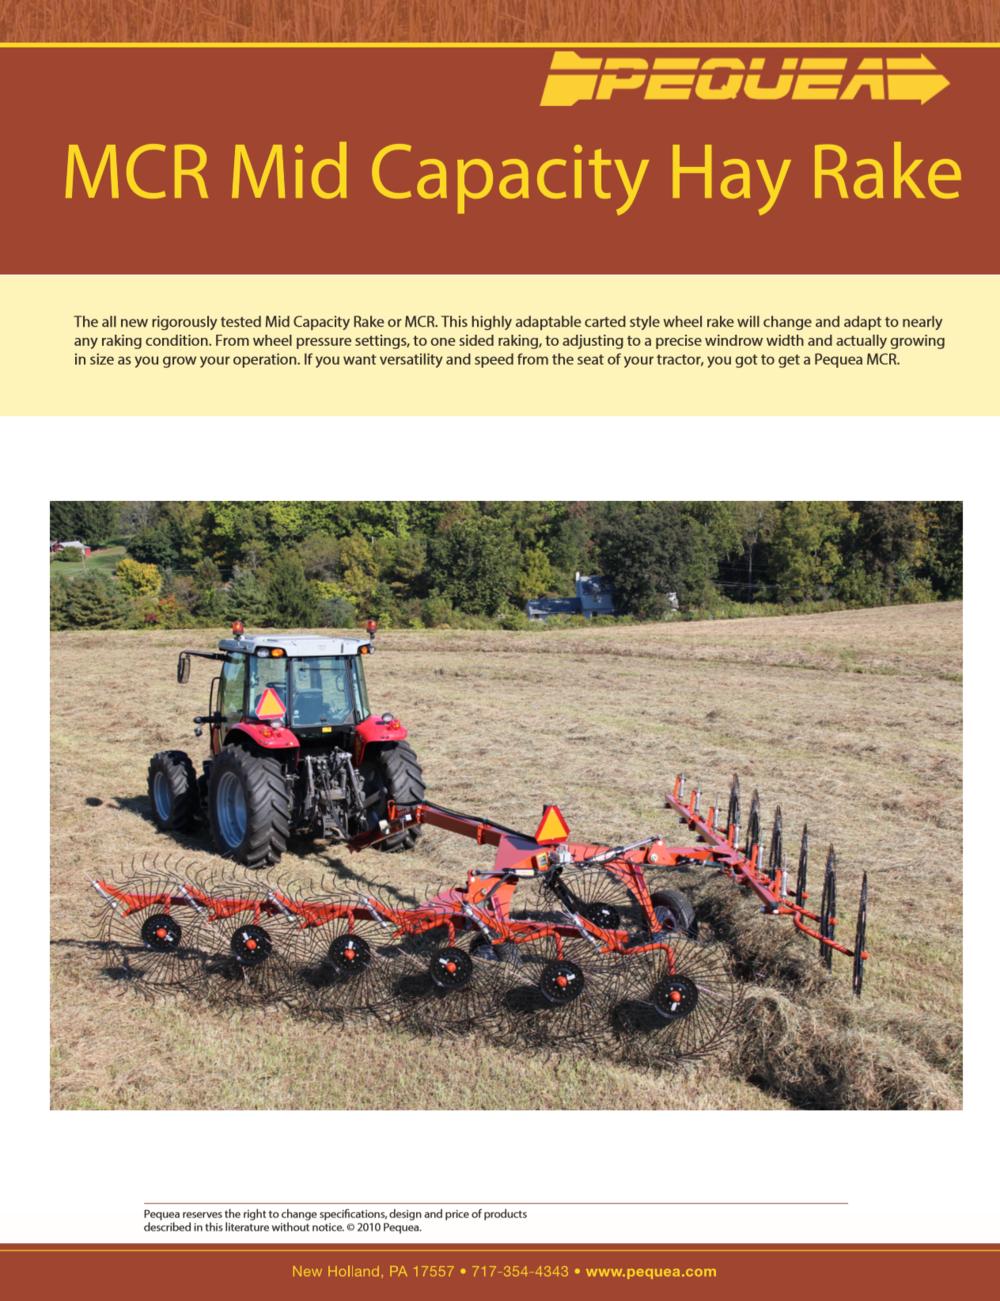 MCR Mid Cap Hay Rake Brochure